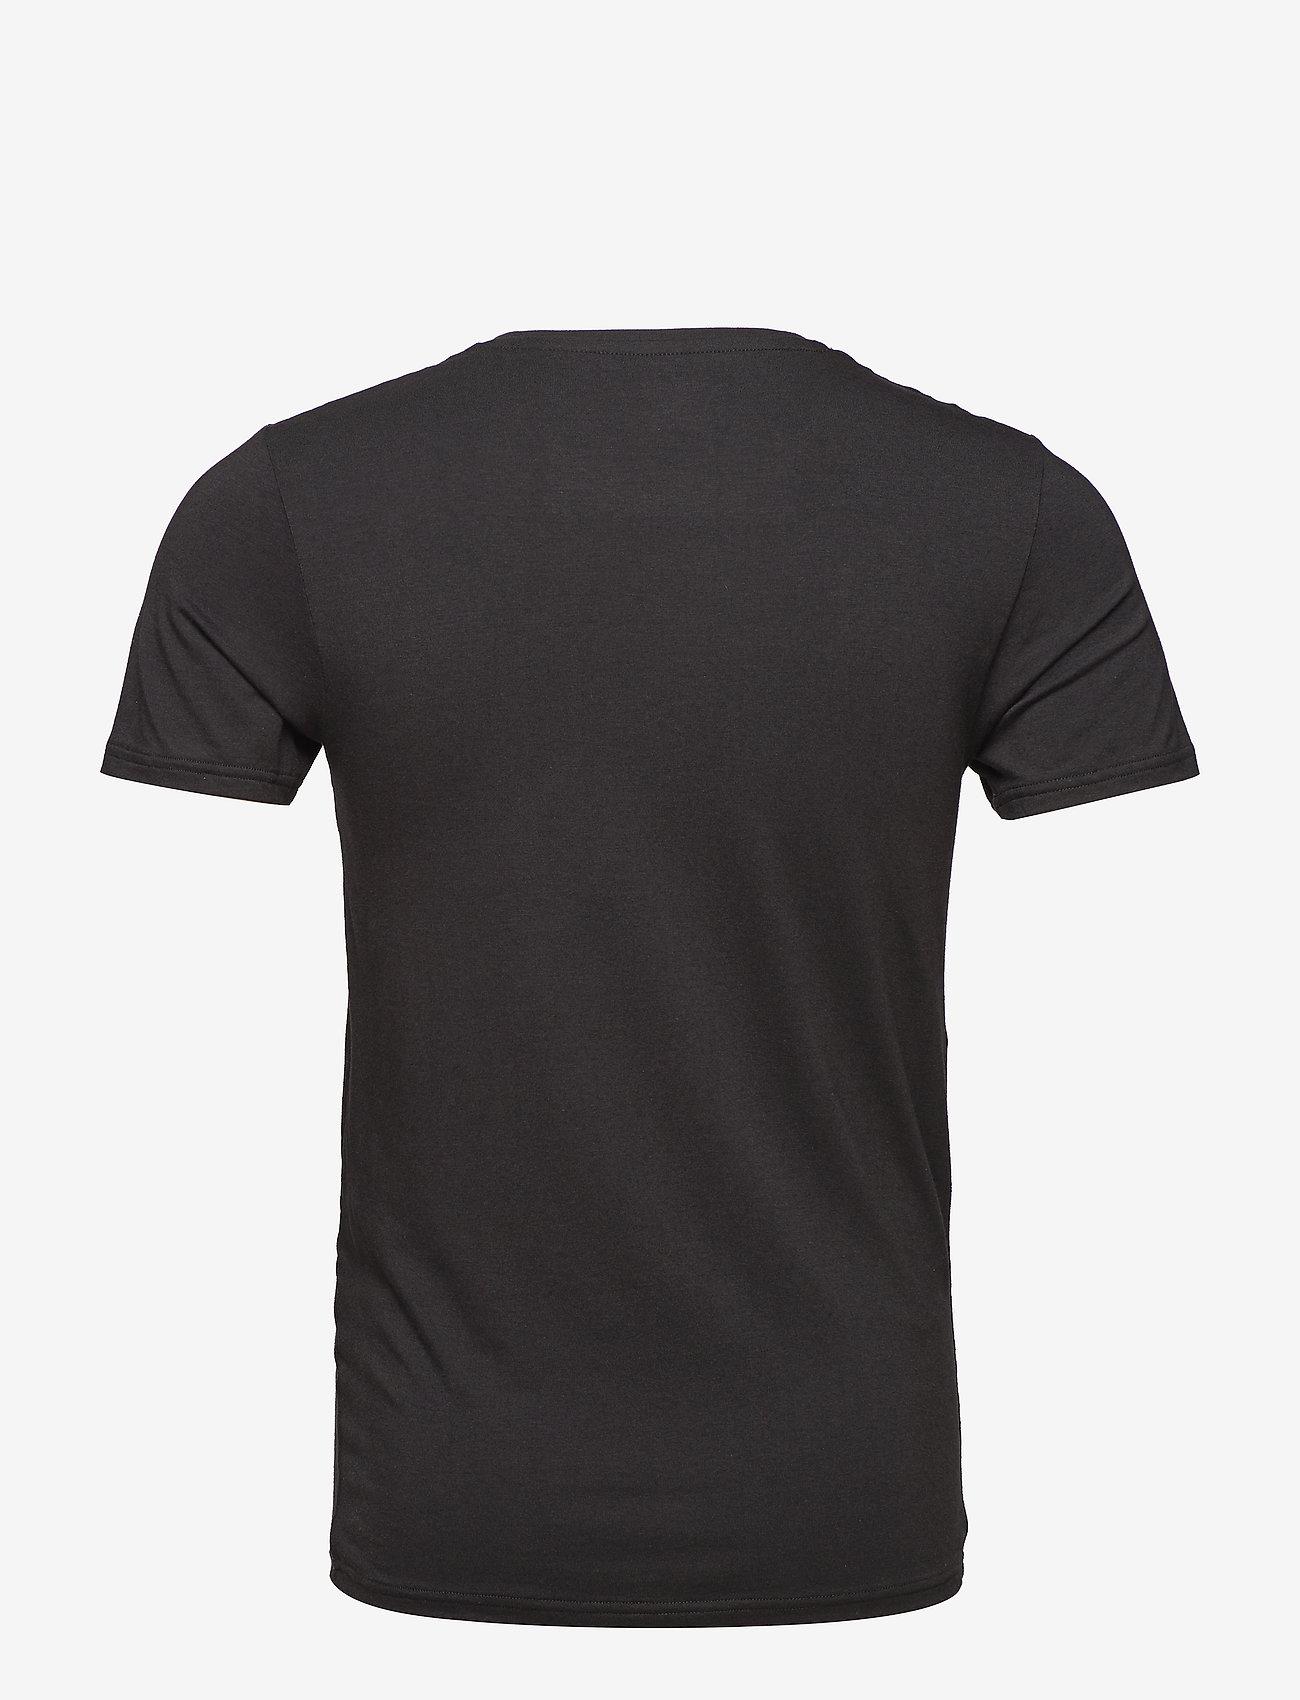 JBS - JBS 2-pack O-neck bamboo - t-shirts basiques - black - 1